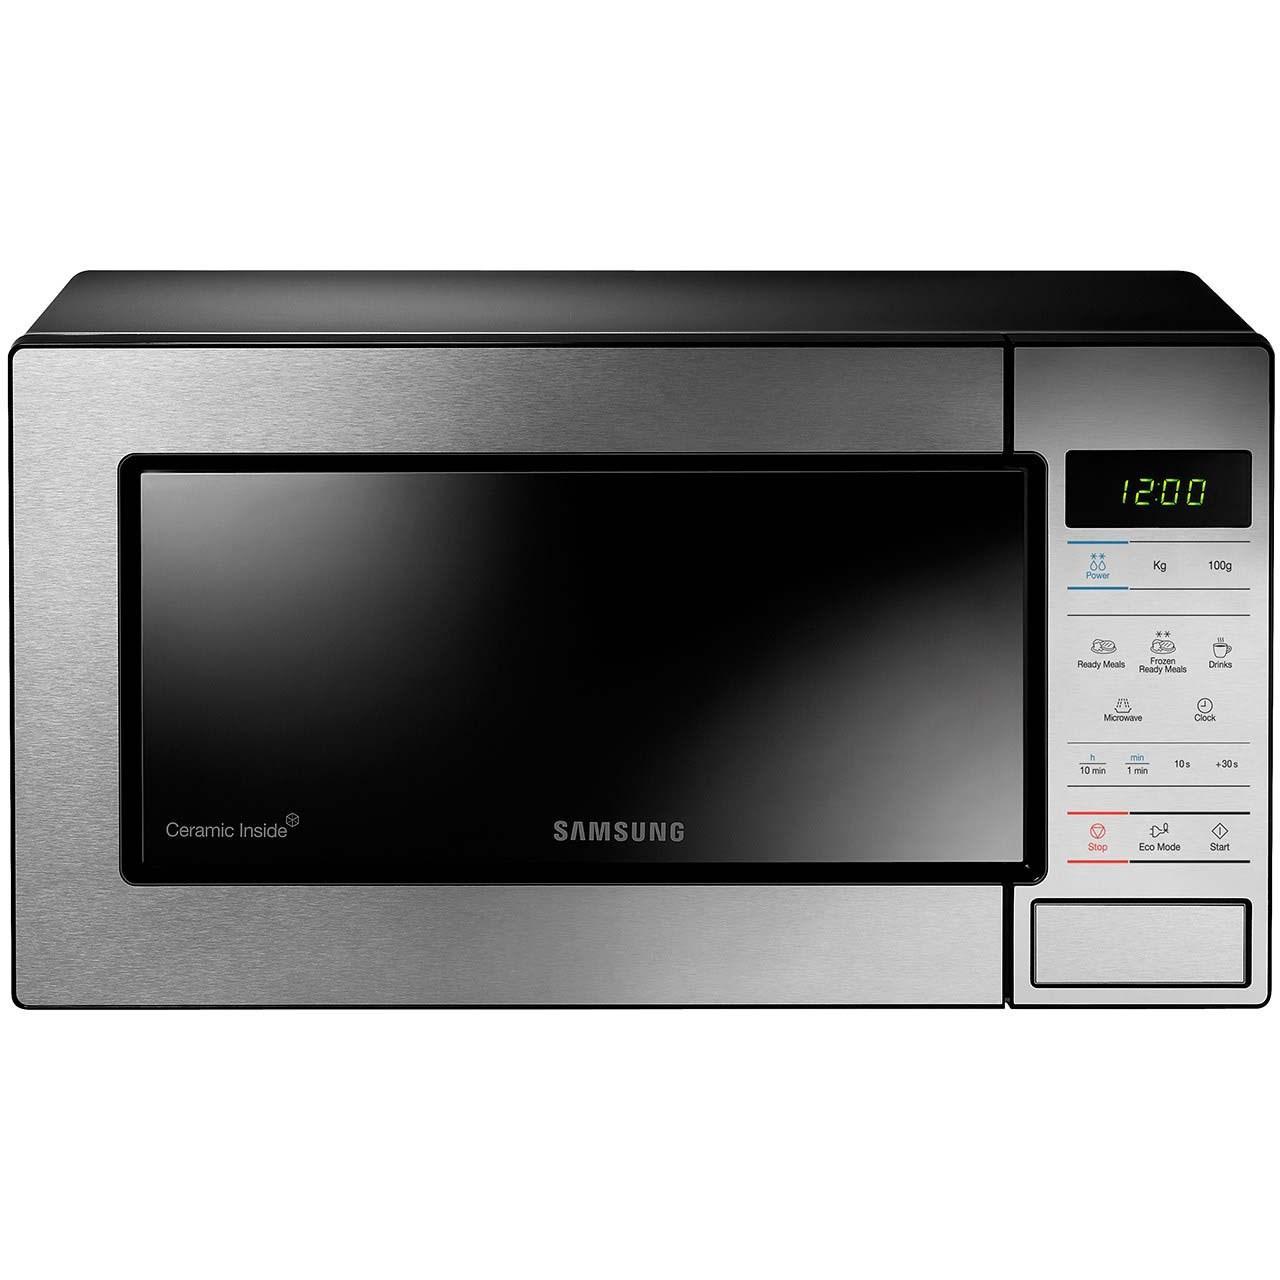 فروش اقساطی مایکروفر رومیزی سامسونگ مدل SAMSUNG Microwave Oven GE234STS 23Liter